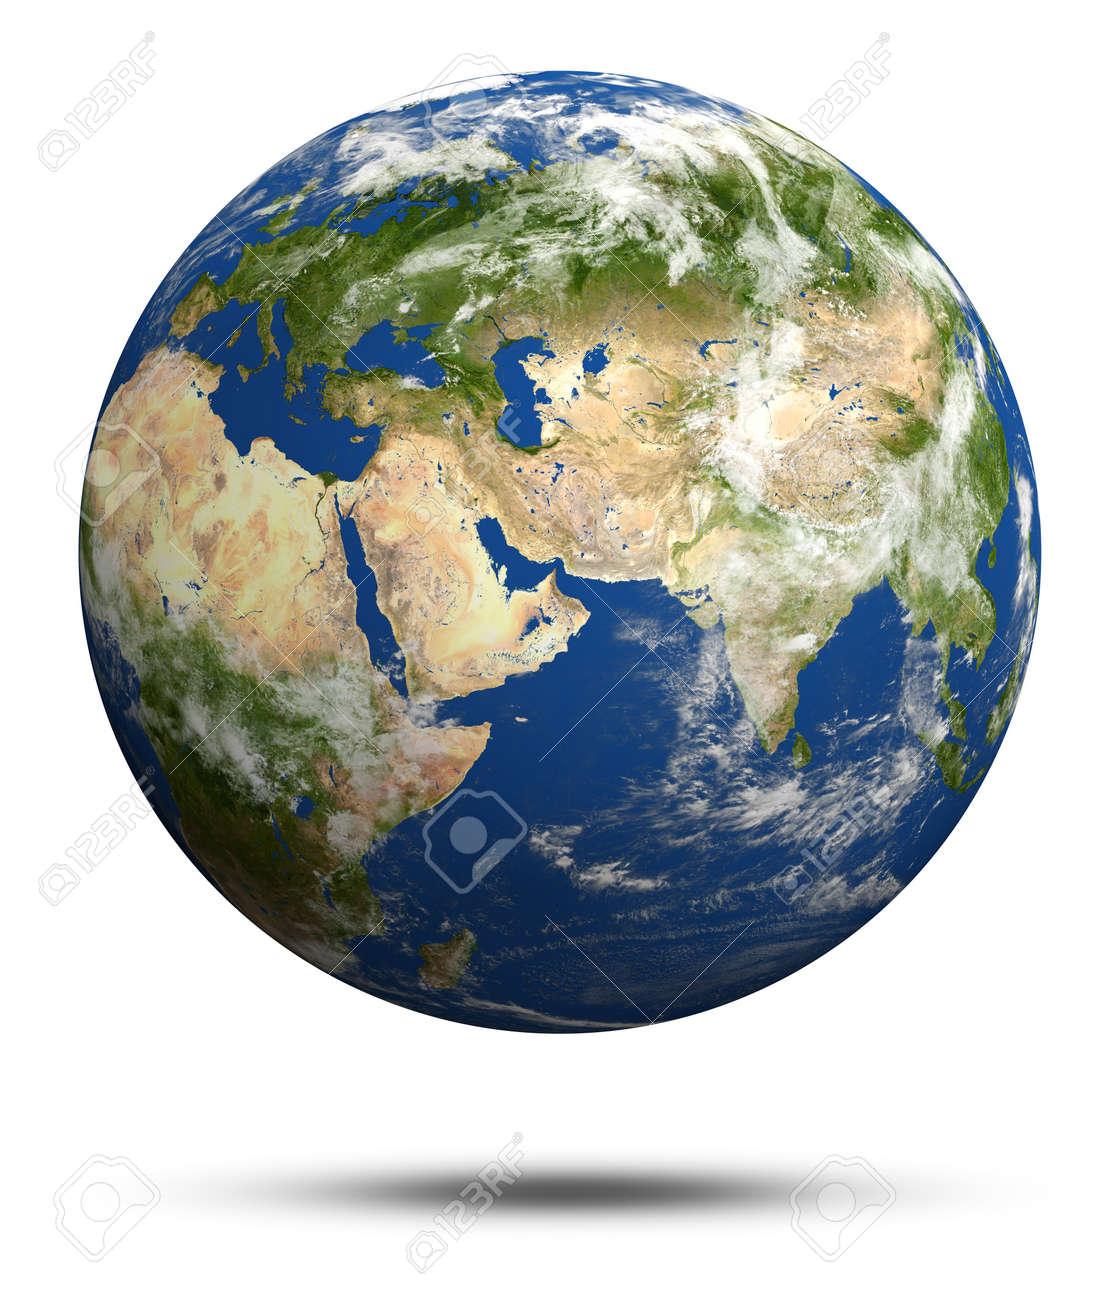 Planet Earth 3d Render Earth Globe Model Maps Courtesy Of Nasa